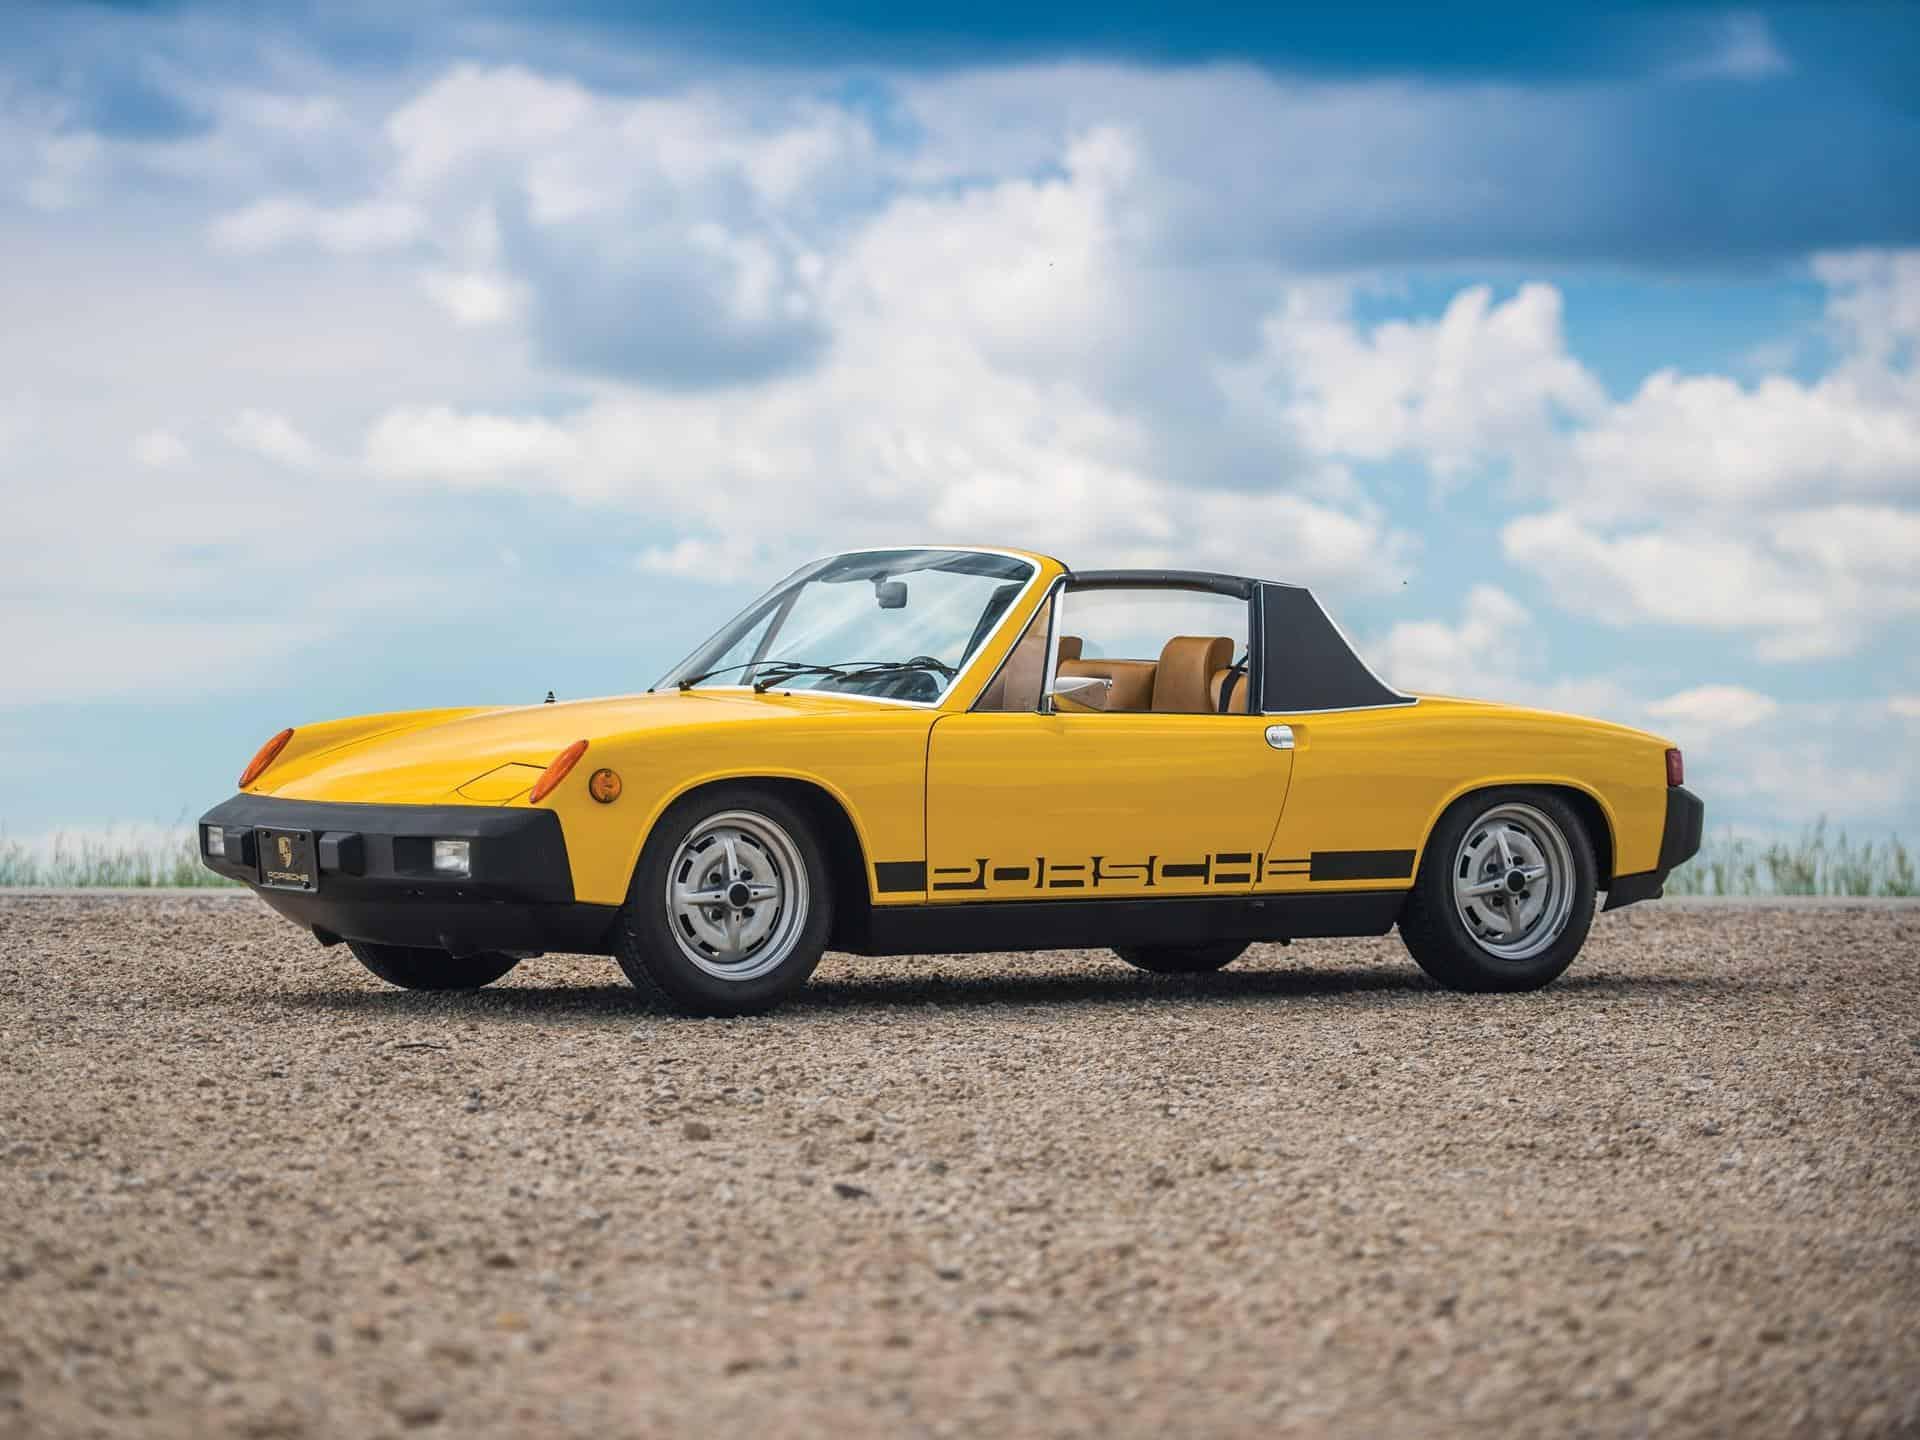 Porsche 914 Best car to buy 2020